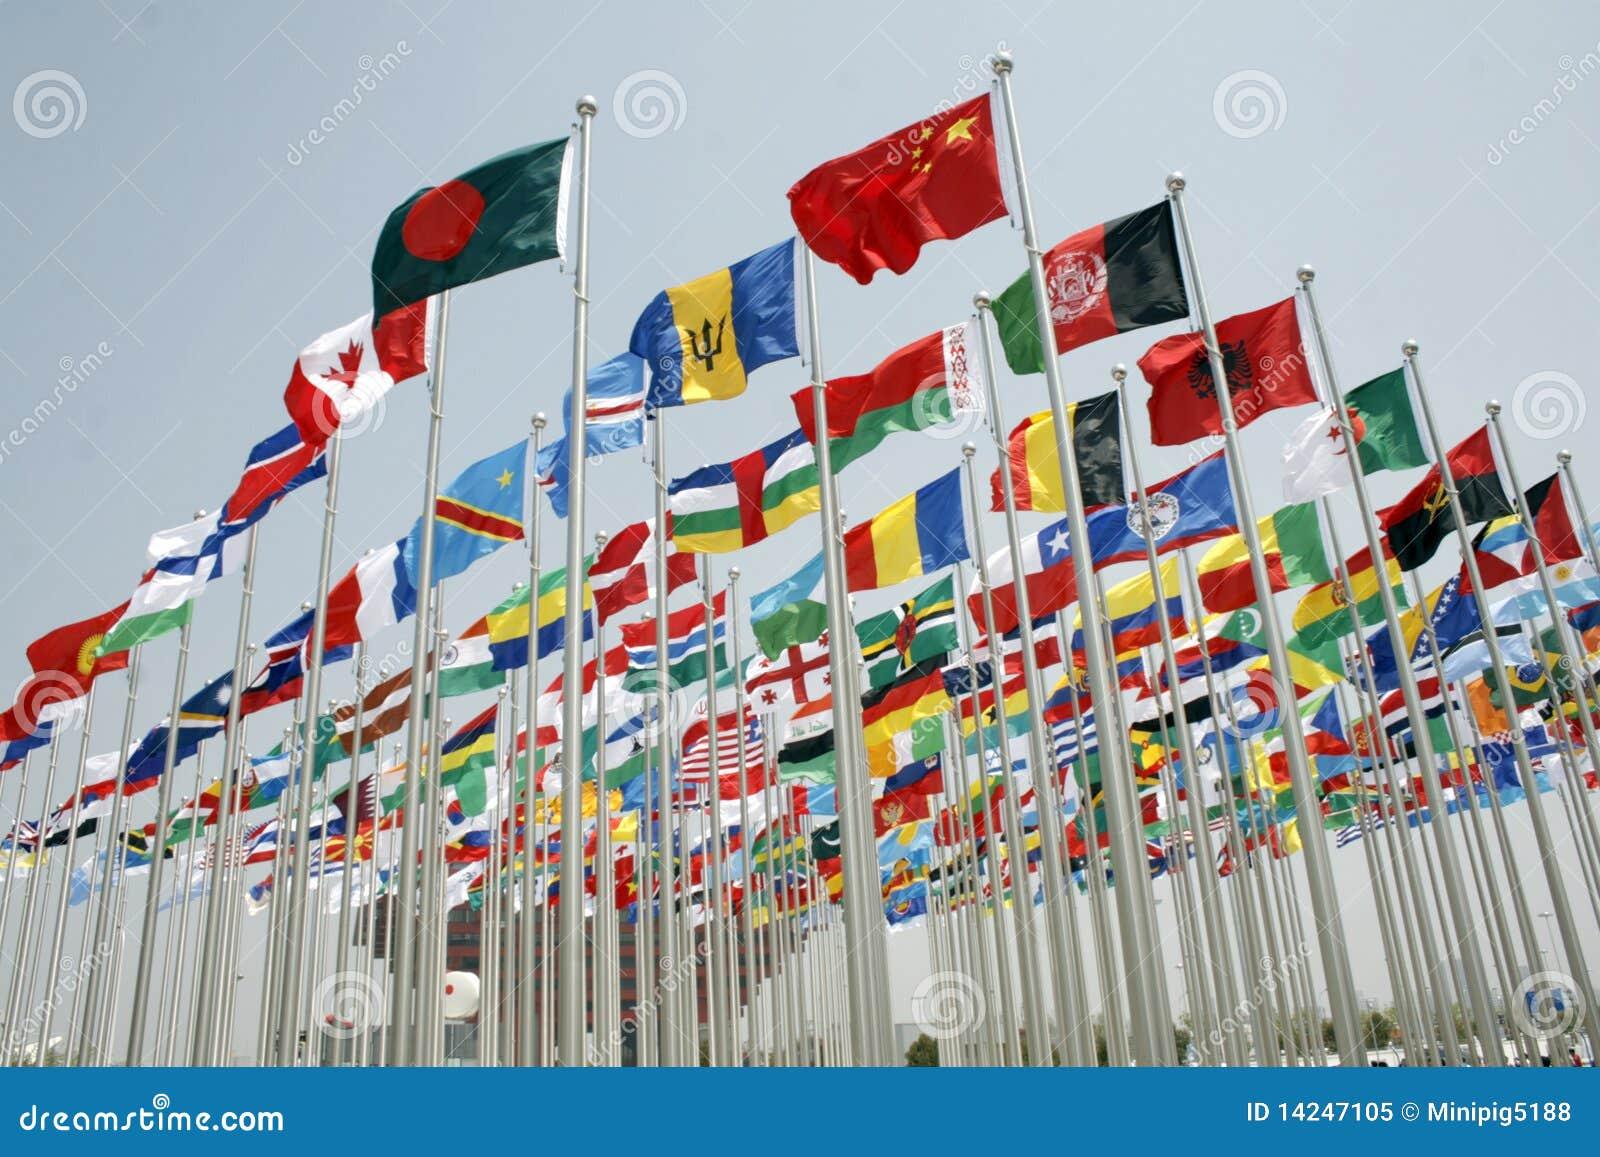 Parque da expo com voo das bandeiras